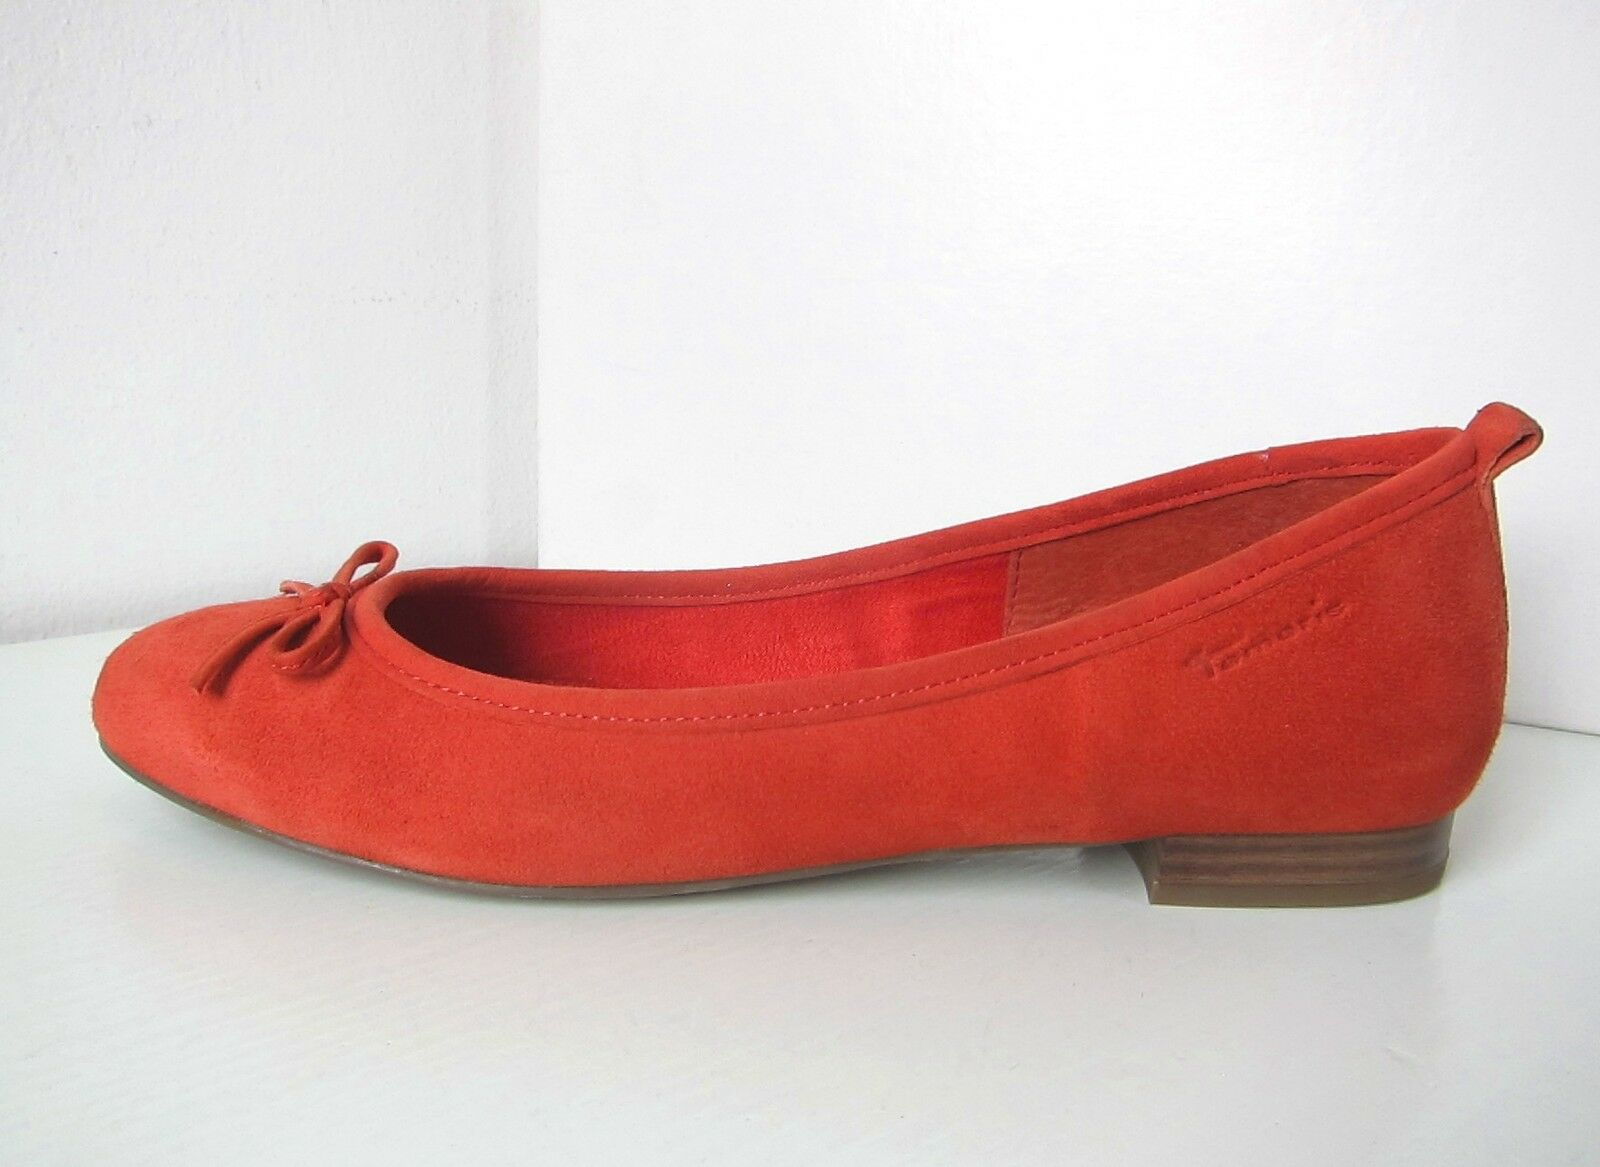 Tamaris ballerina camoscio mandarino Taglia 39 Birago SUEDE  scarpe  SUEDE  232f4f